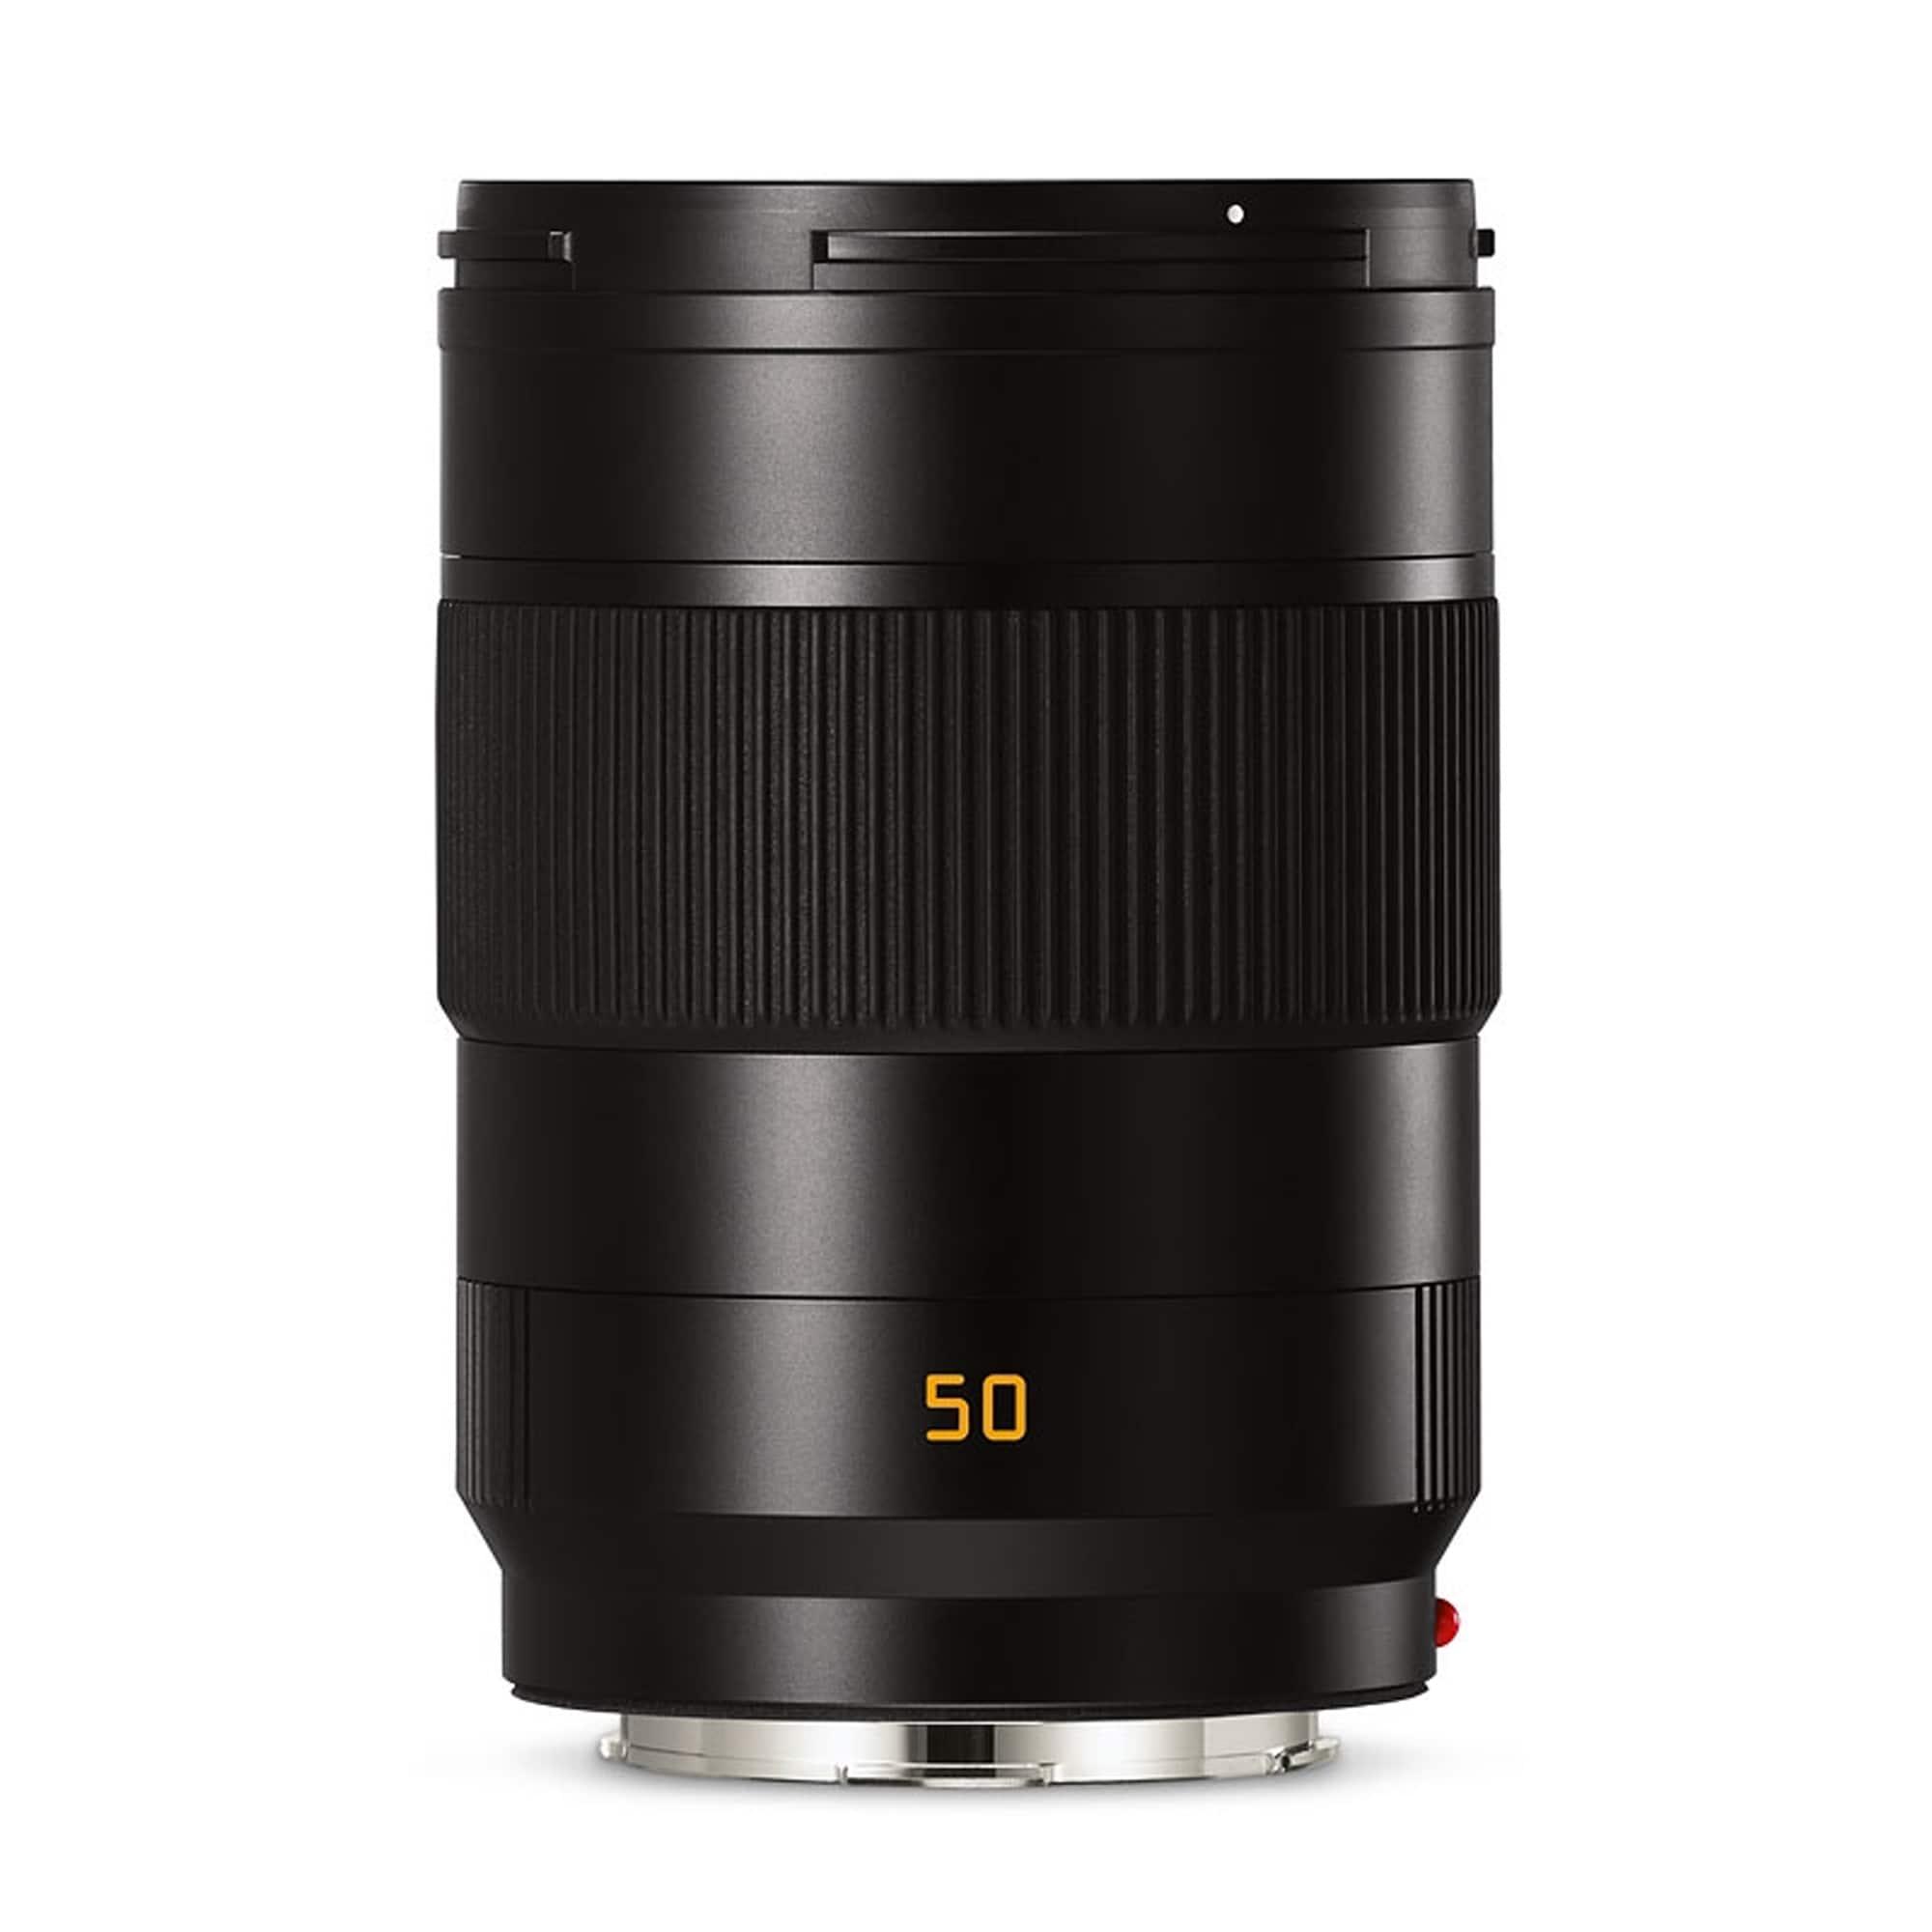 Leica SL 50/2,0 APO Summicron ASPH